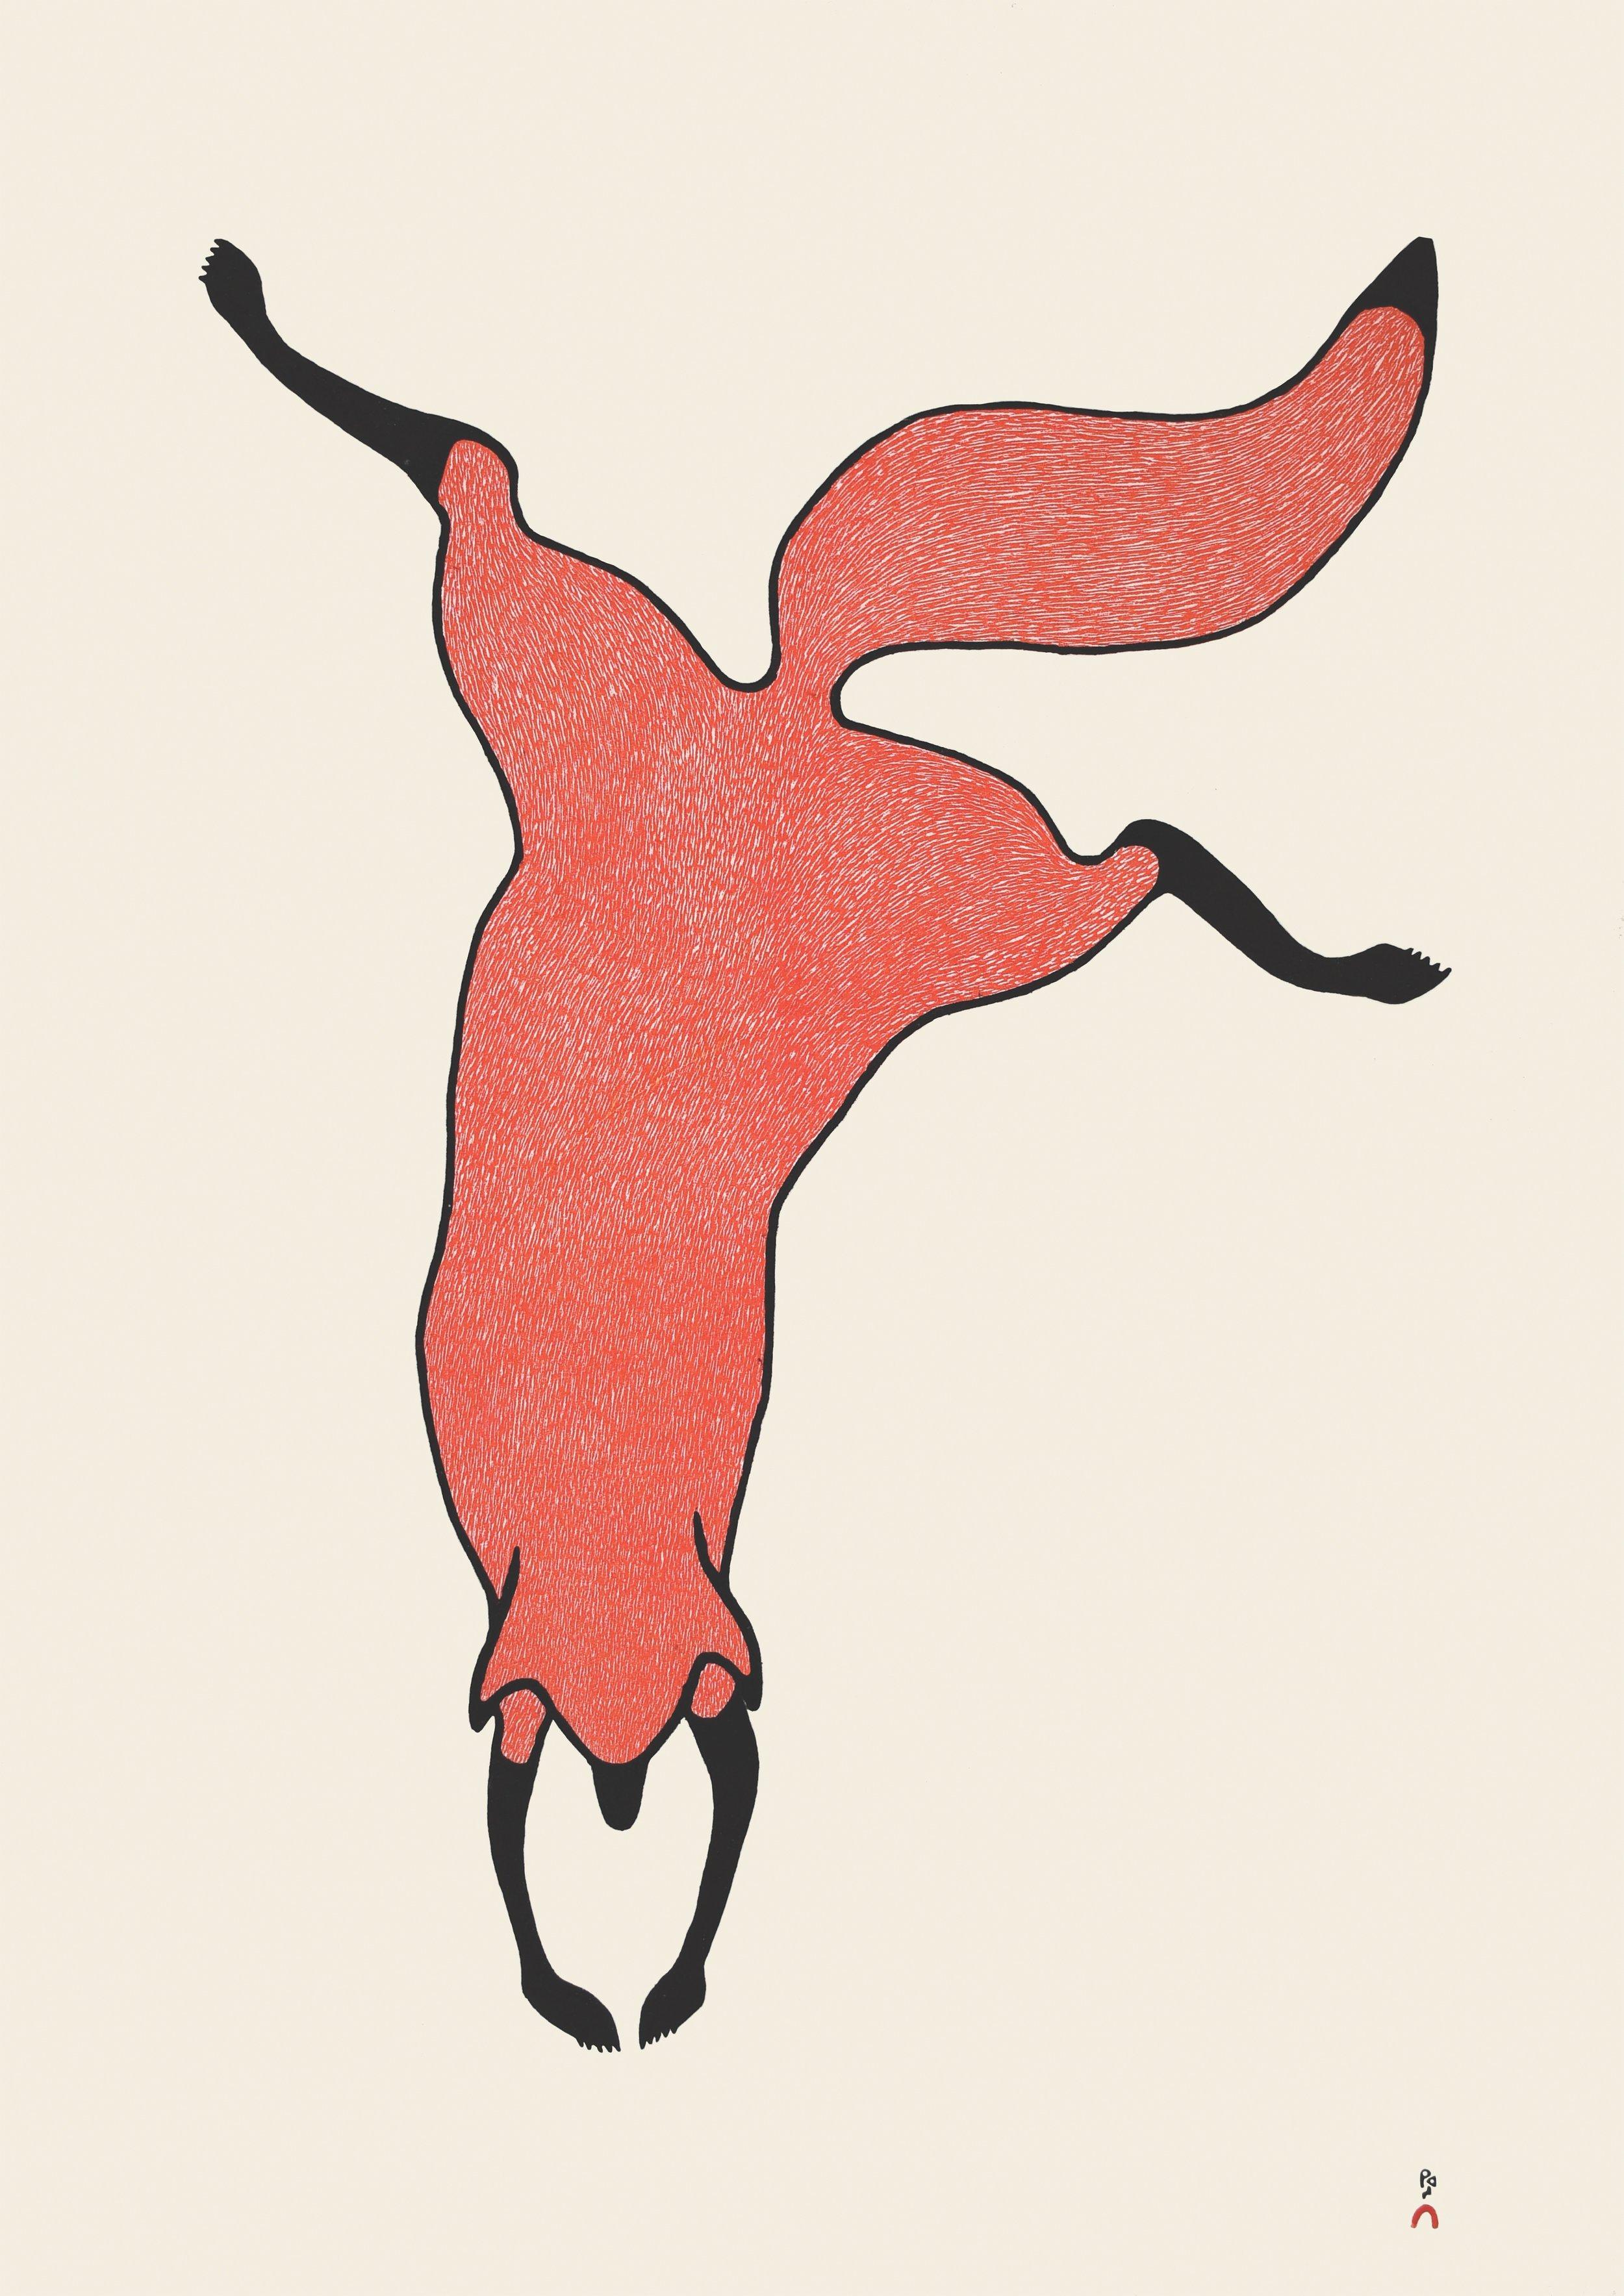 QUVIANAQTUK PUDLAT  30. Agile Fox  Stonecut  Paper: Kizuki Kozo Natural  Printer: Qiatsuq Niviaqsi  83.8 x 58.5 cm  $ 900